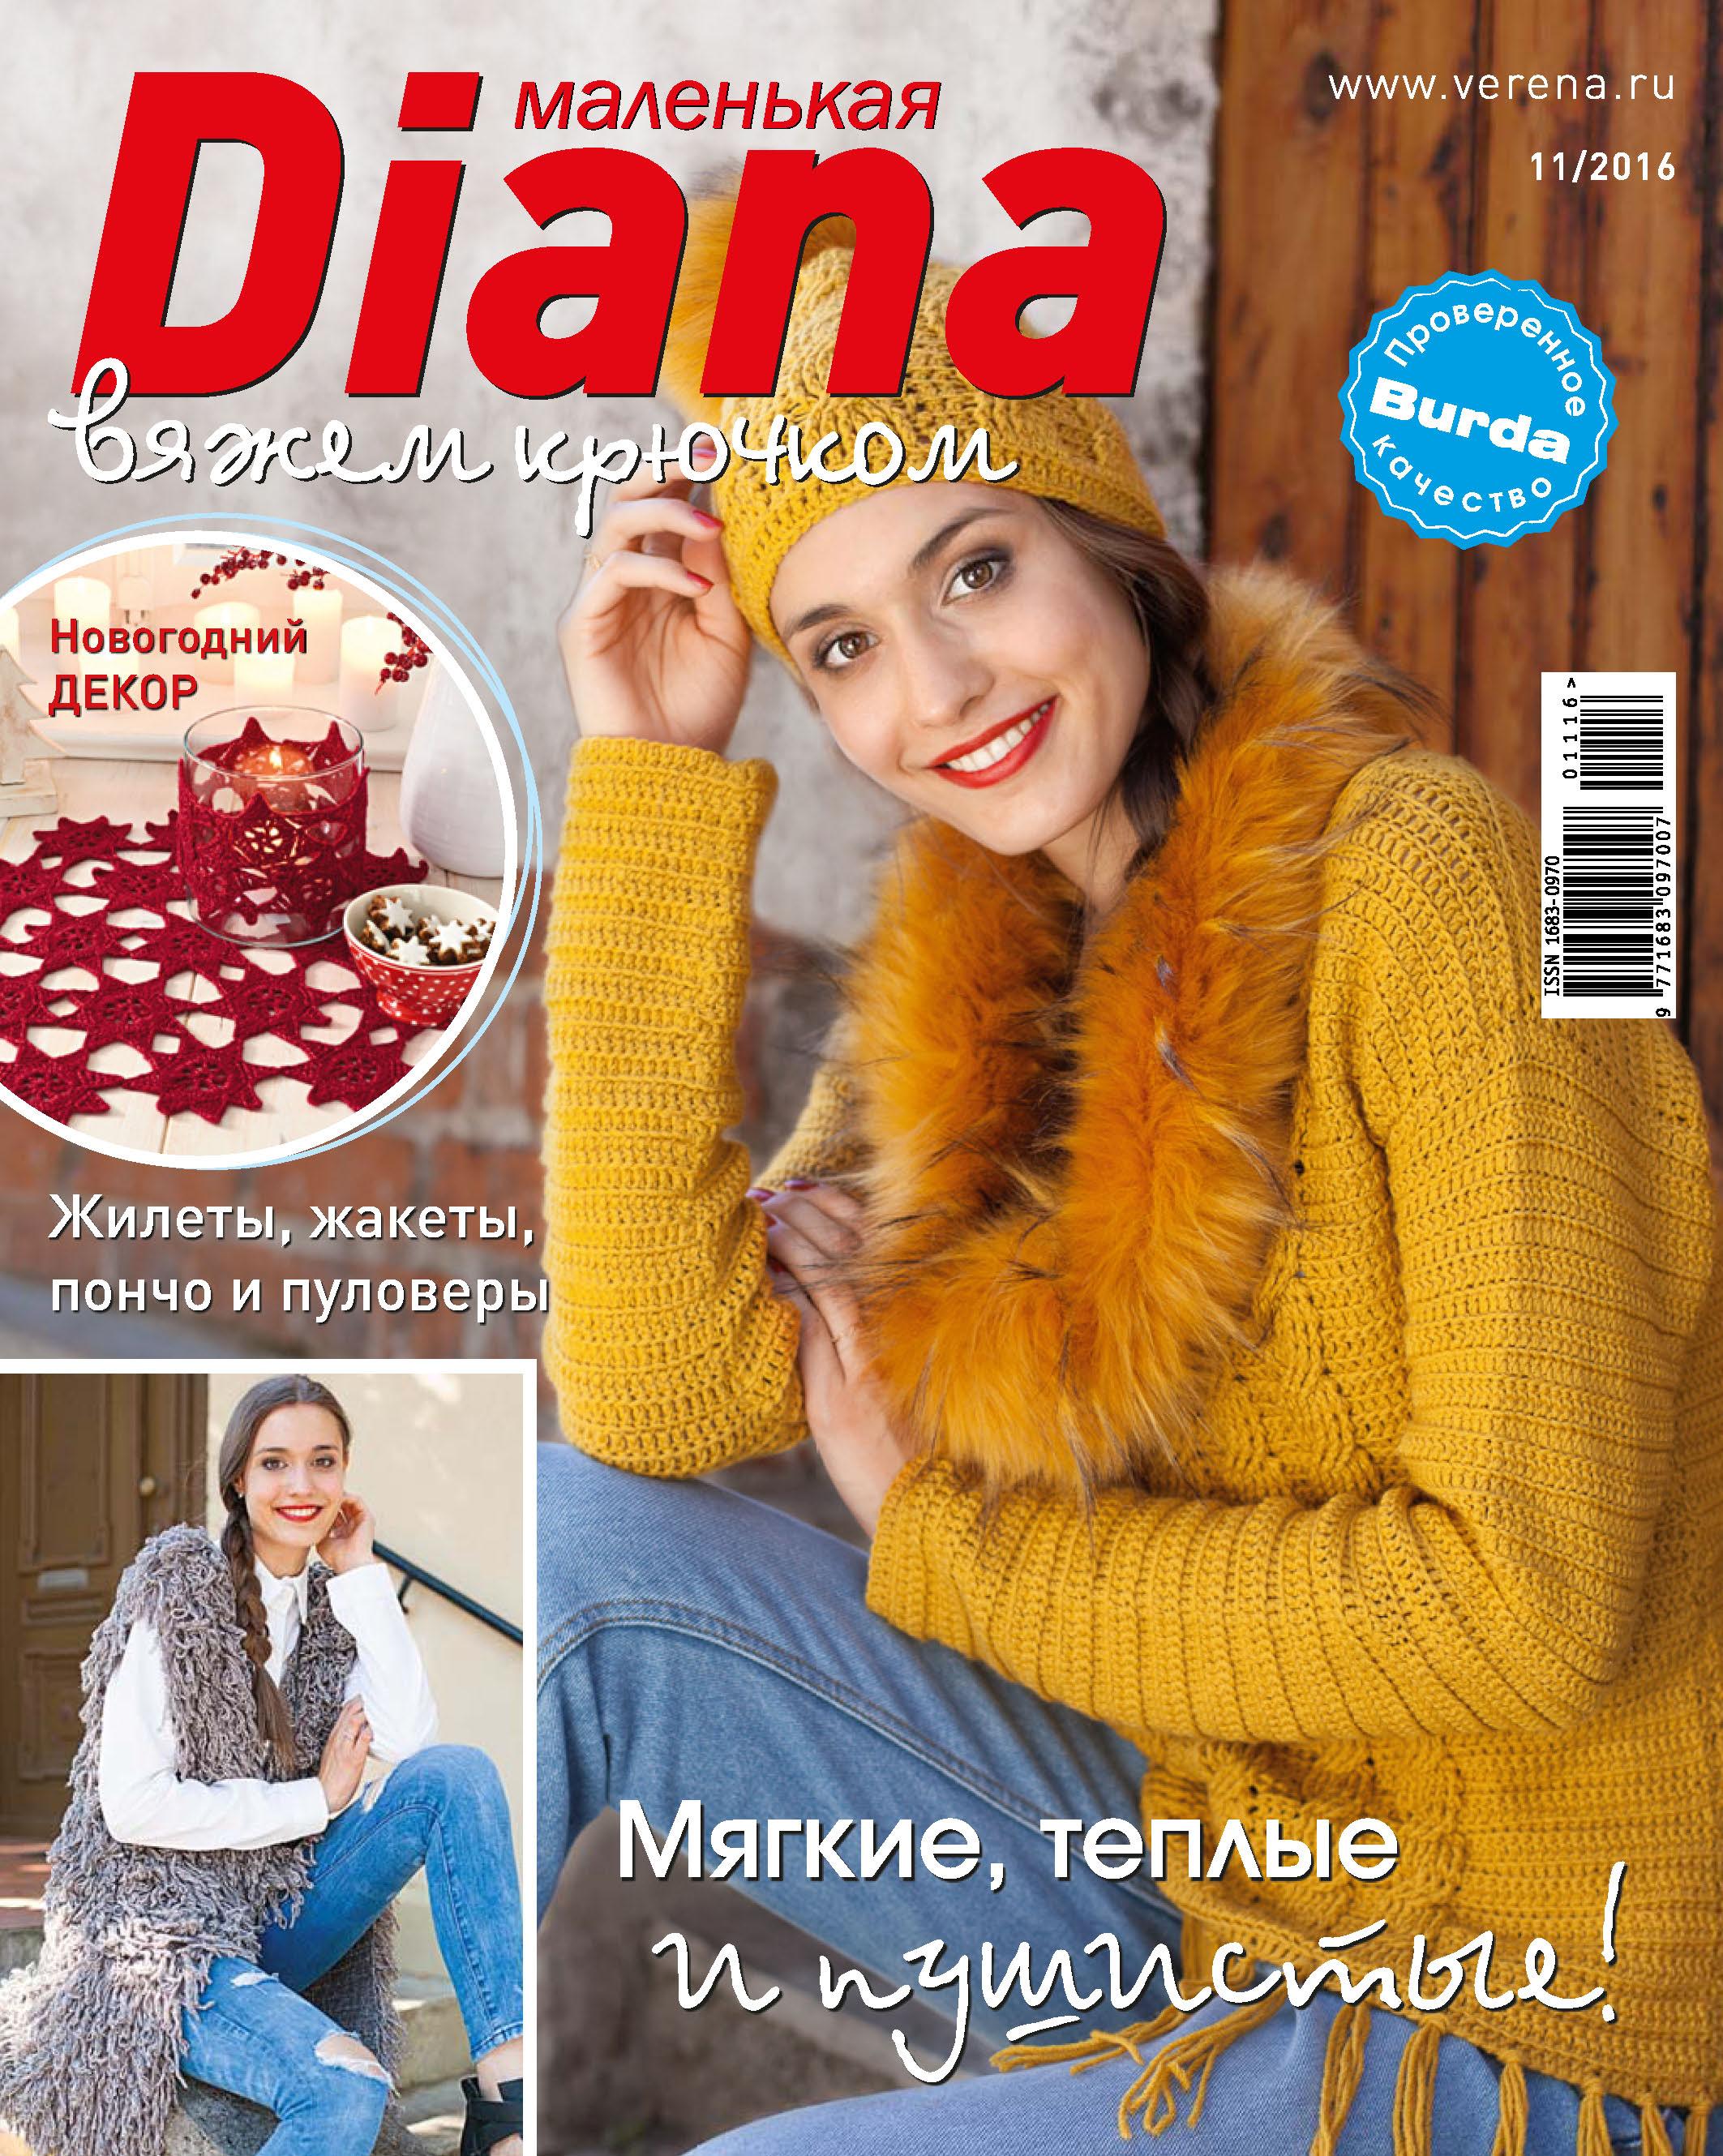 ИД «Бурда» Маленькая Диана №11/2016